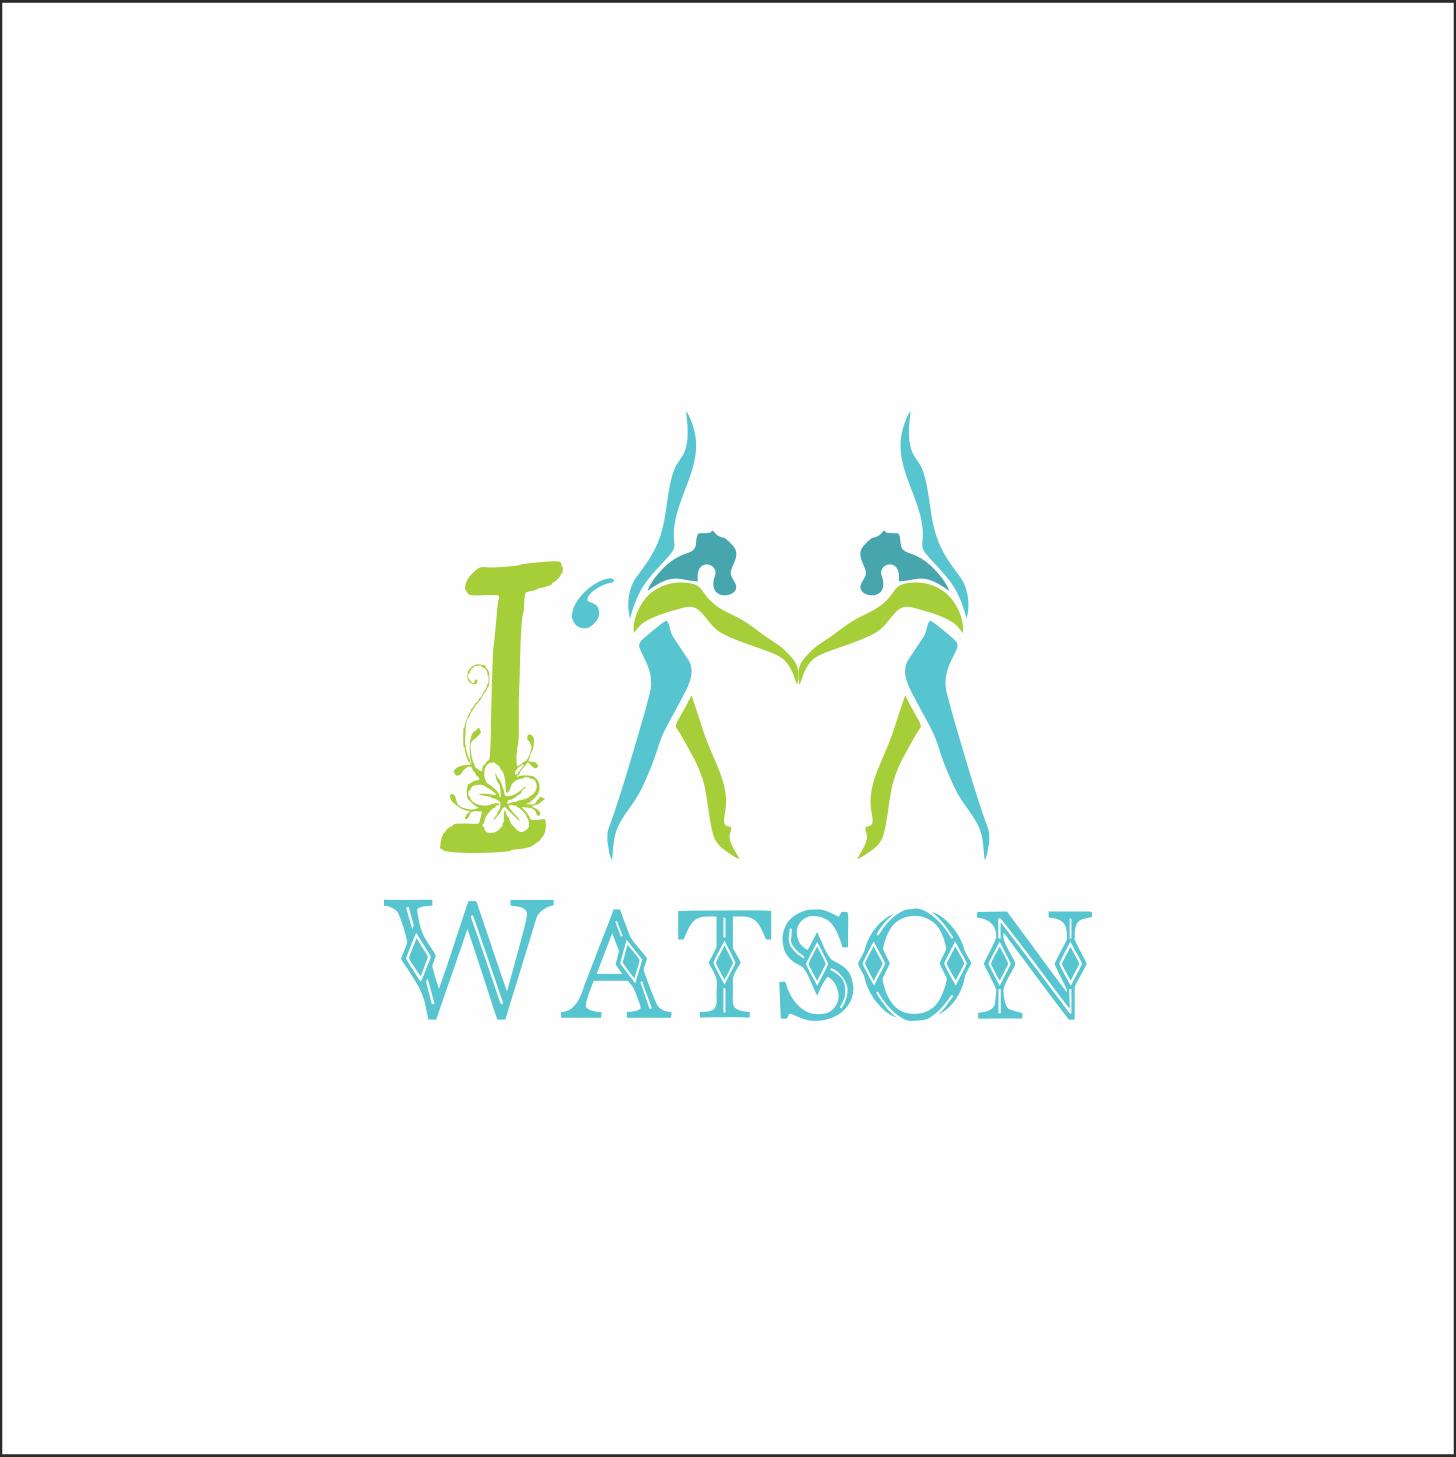 Разработать логотип для балетного бренда фото f_4335bbde3a032f92.png